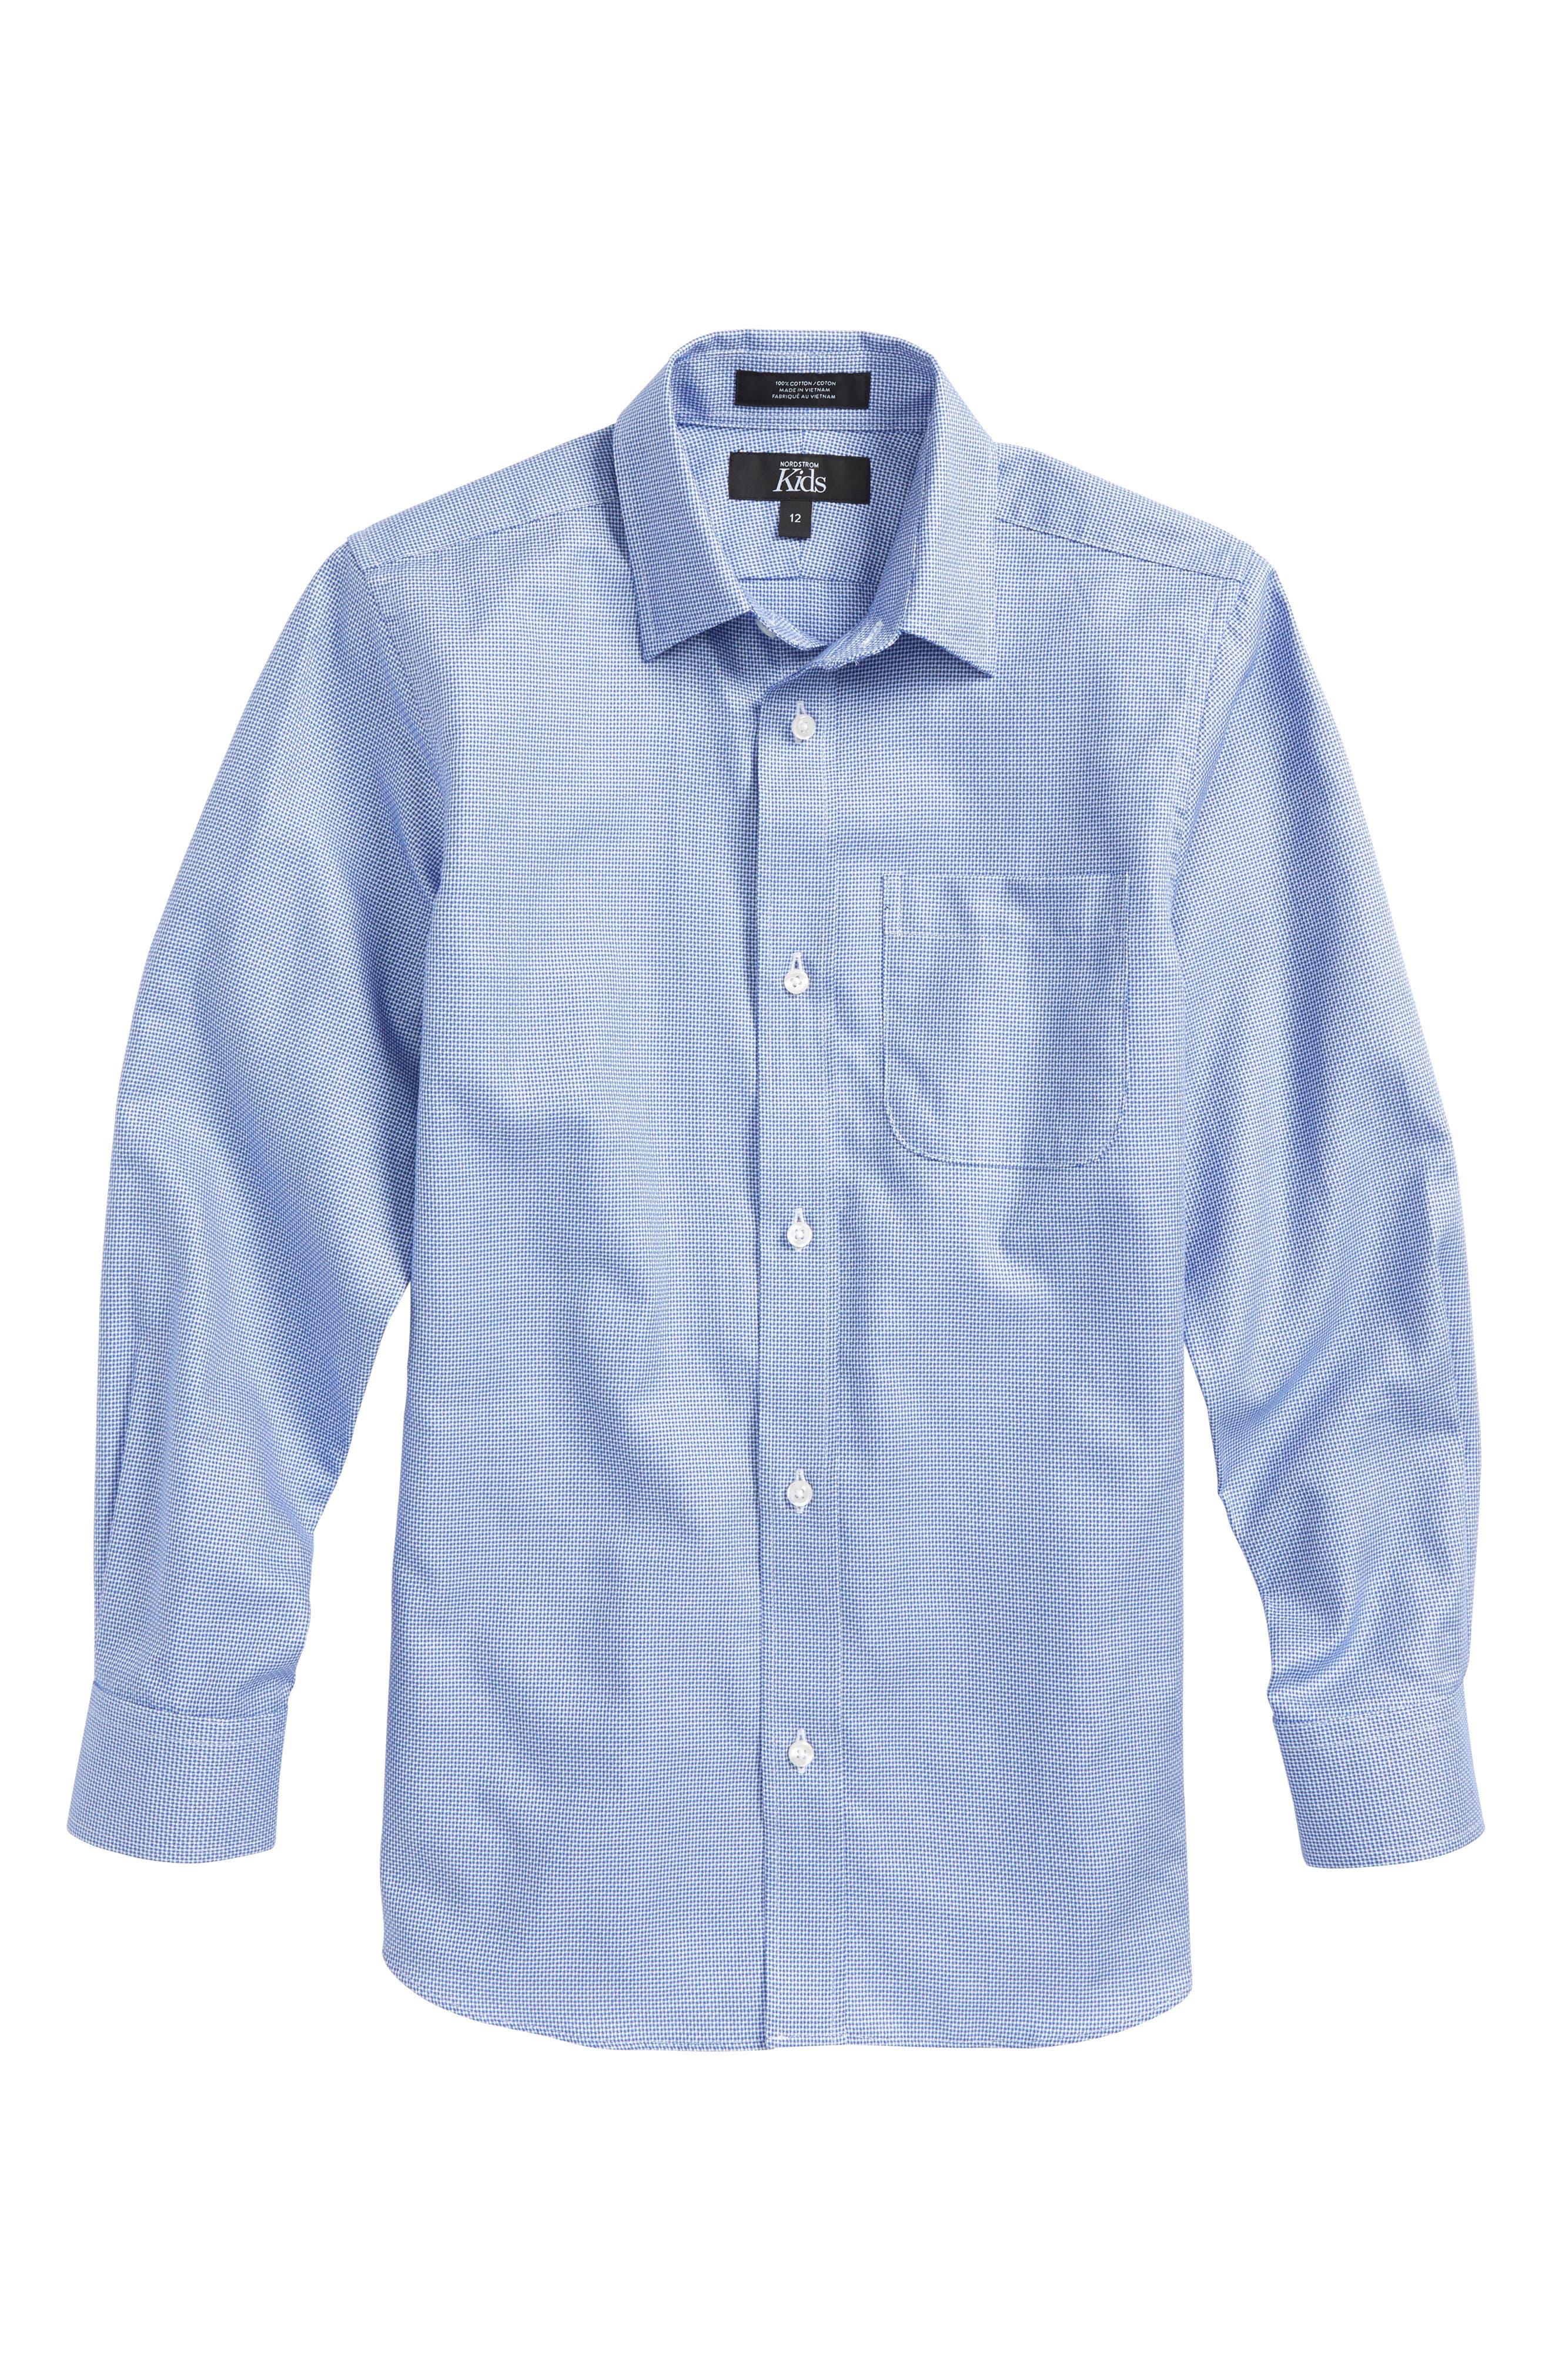 Sodalite Dobby Sport Shirt,                         Main,                         color, Blue Sodalite Dobby